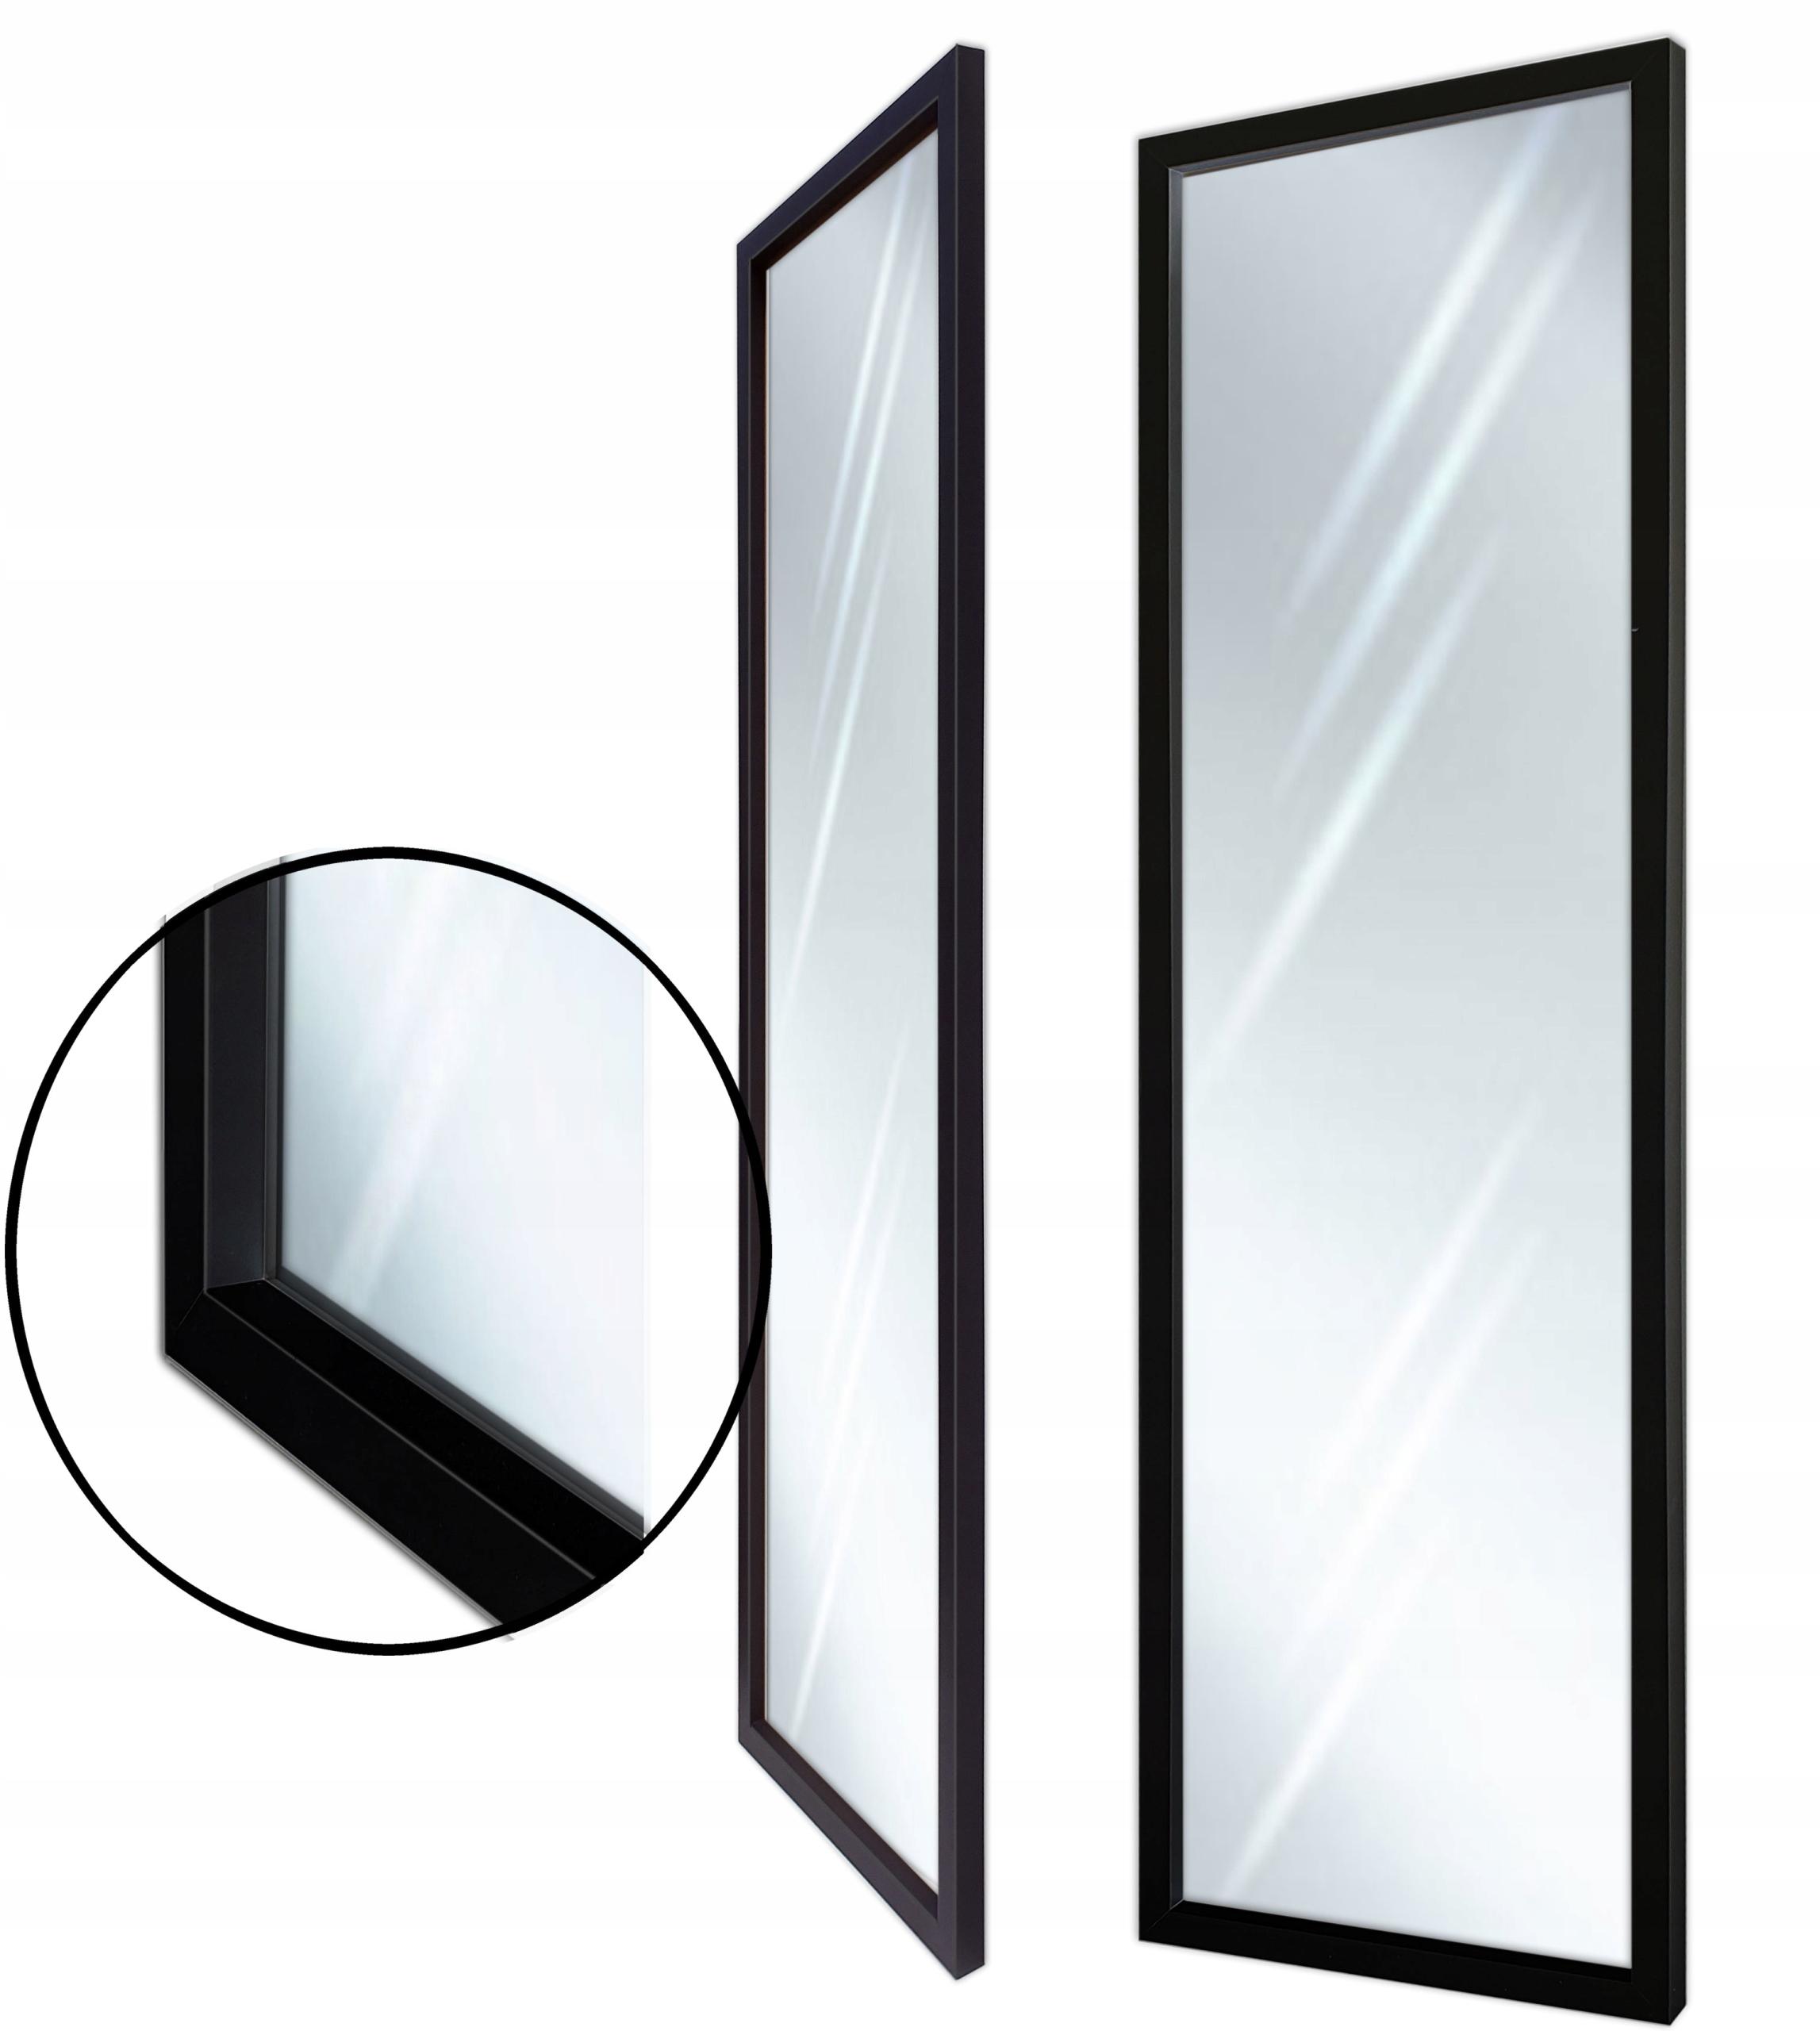 Зеркало в раме 160x60 165x65 modern black 3D